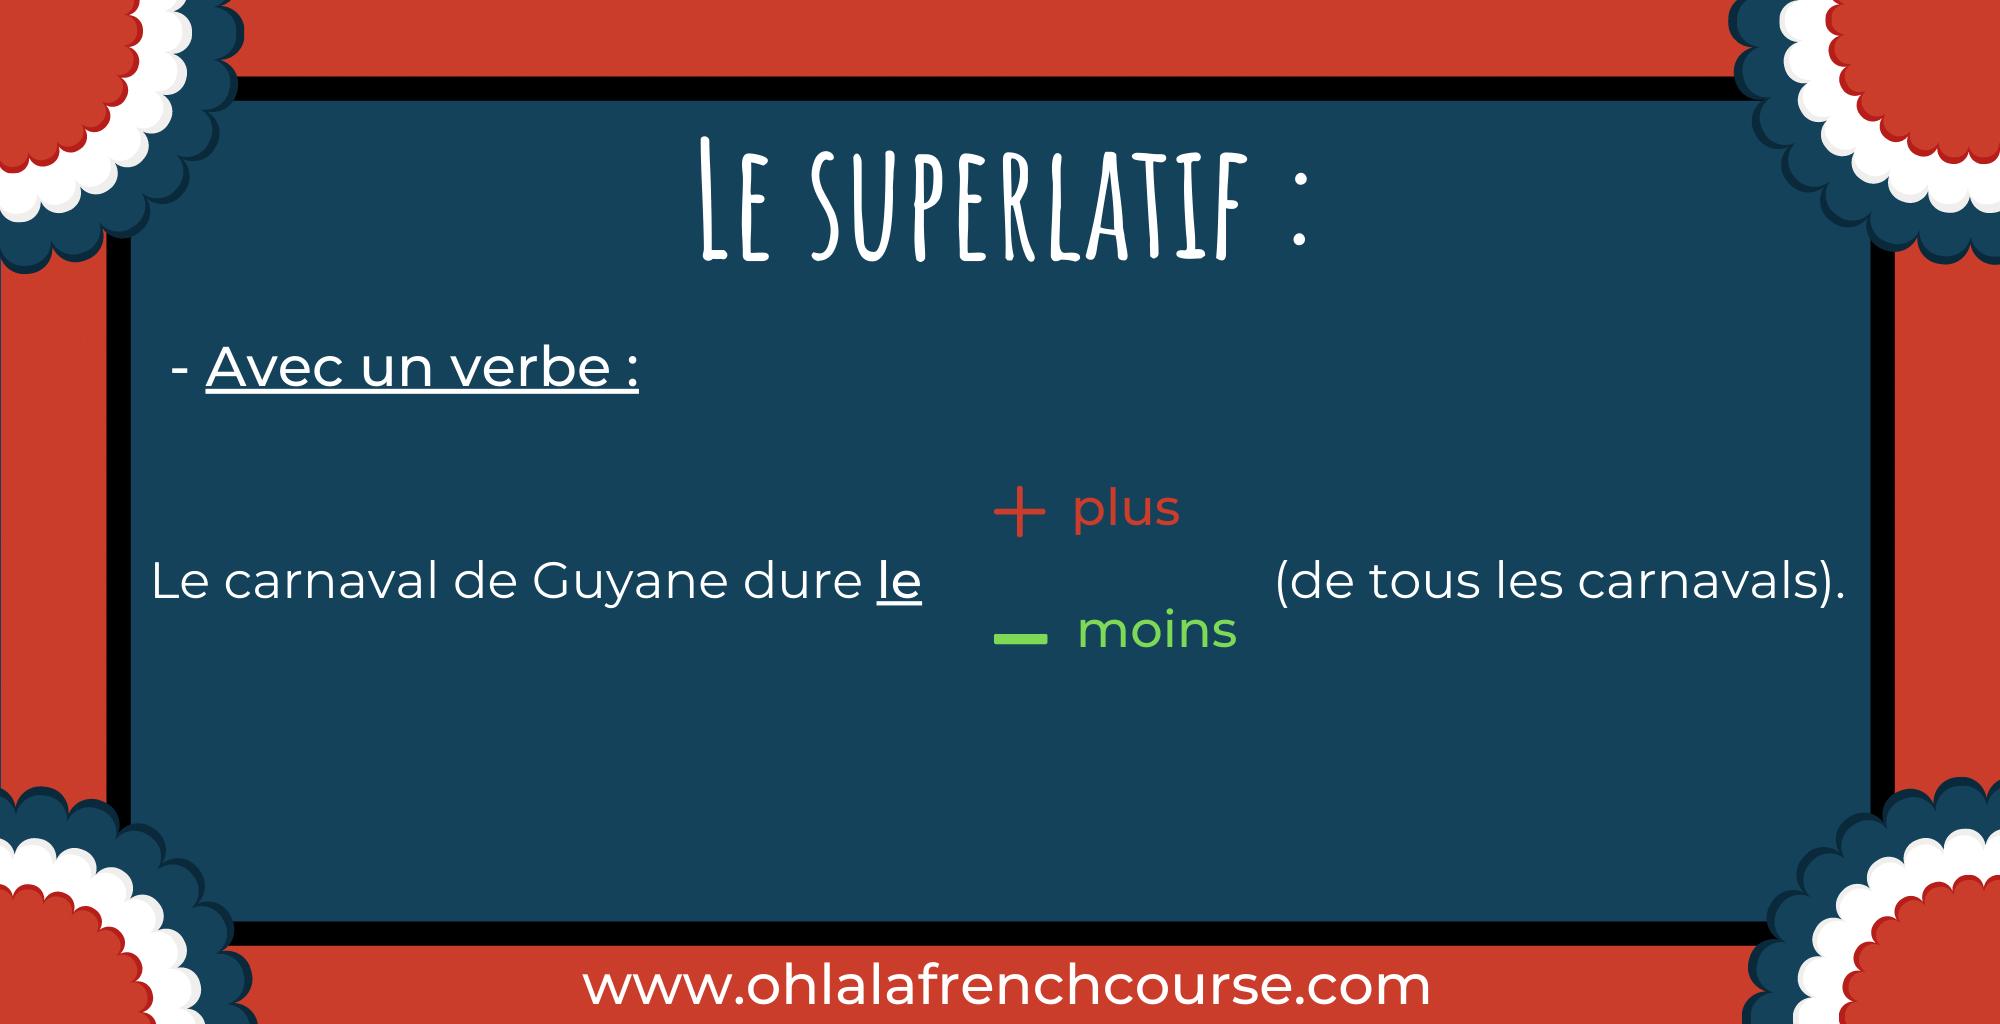 Le superlatif - Lesuperlatif avec un verbe